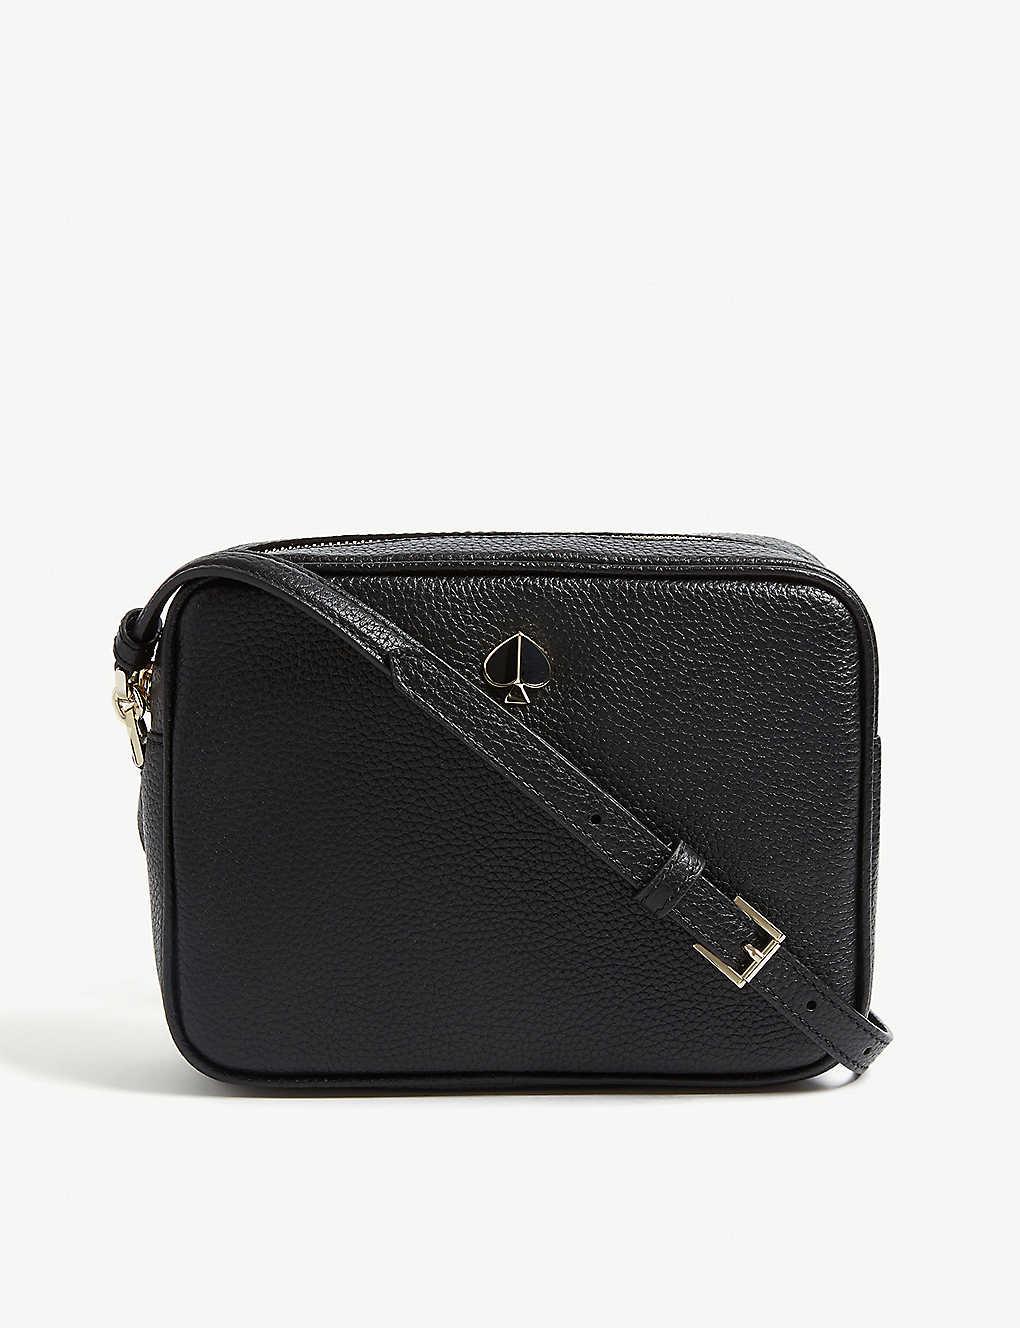 Kate Spade New York Polly Medium Leather Camera Cross Body Bag Selfridges Com